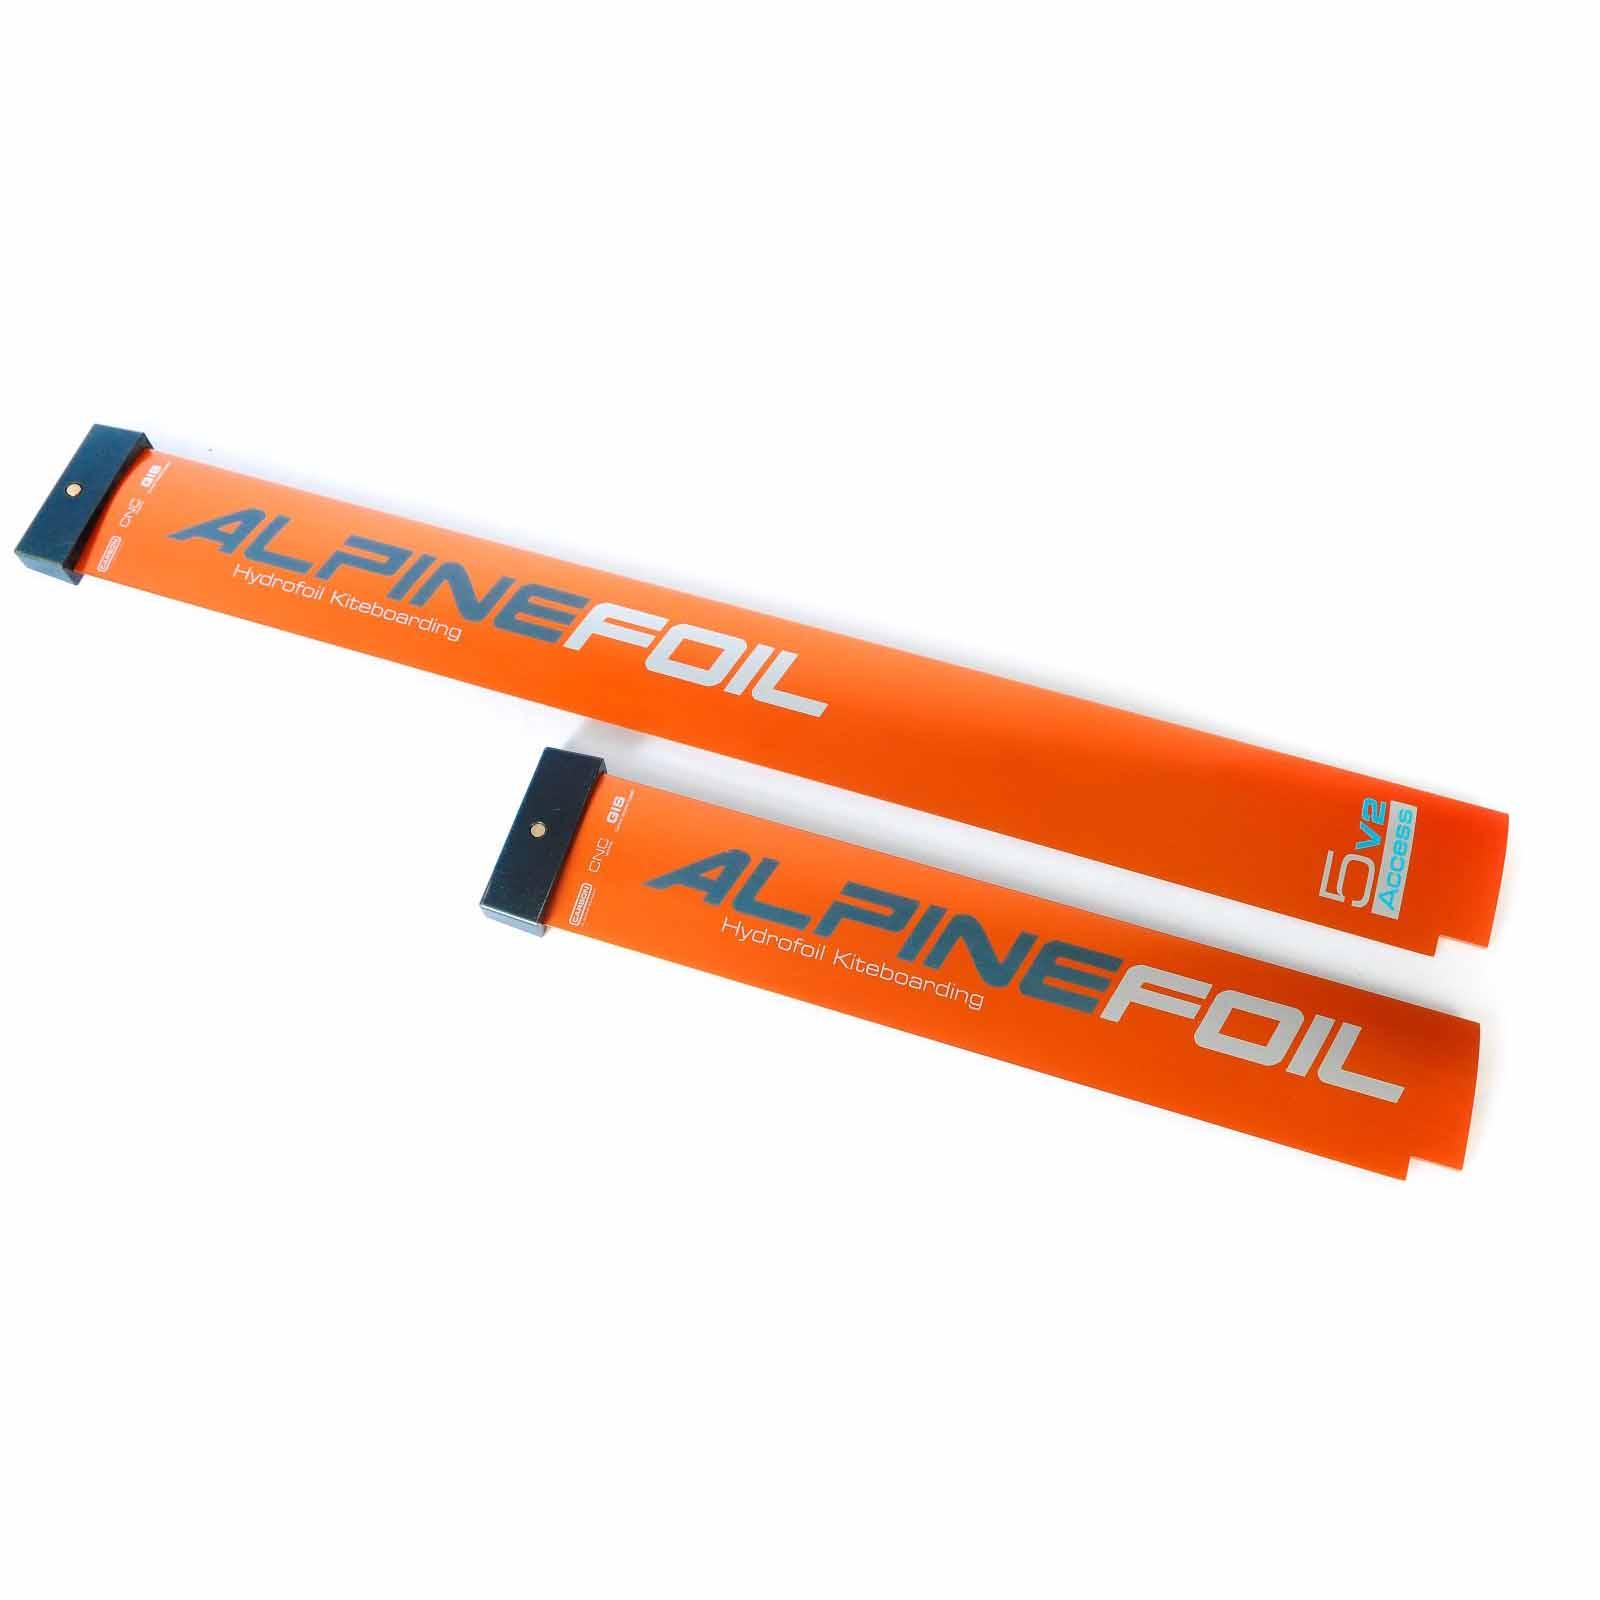 Kitefoil carbon aluminium alpinefoil 5